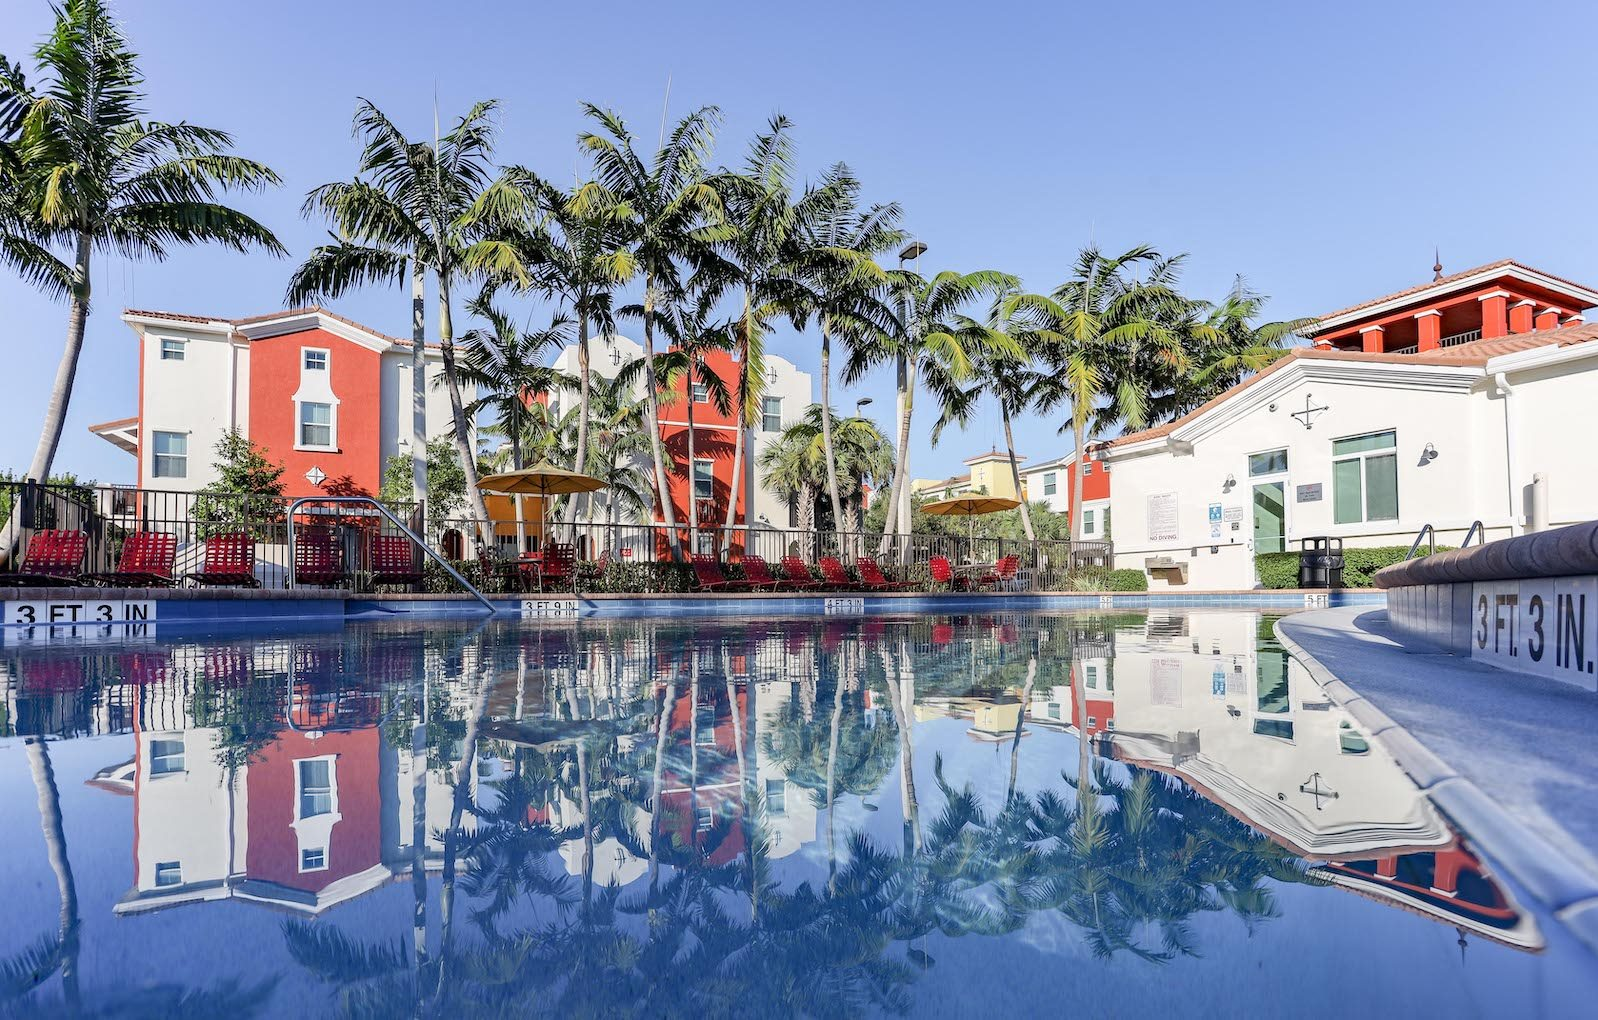 East Village Apartments in Davie, Florida pool slider